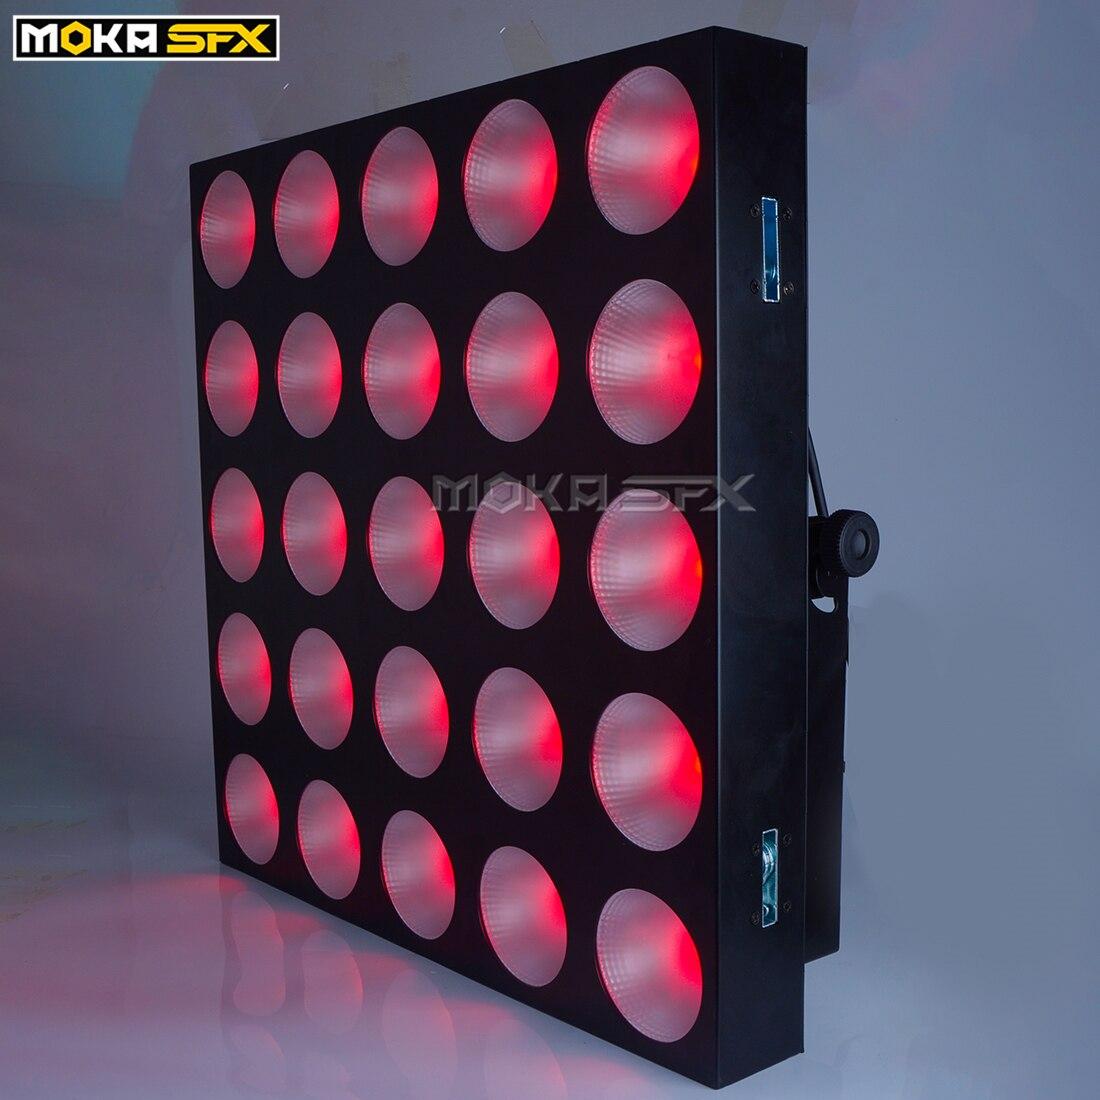 Bar DJ Party Stage Effect Lighting 30W AC100V-240V 50/60Hz LED Matrix Lights Auto / Master/Slave / DMX Of Control Mode 6Pcs/Lot